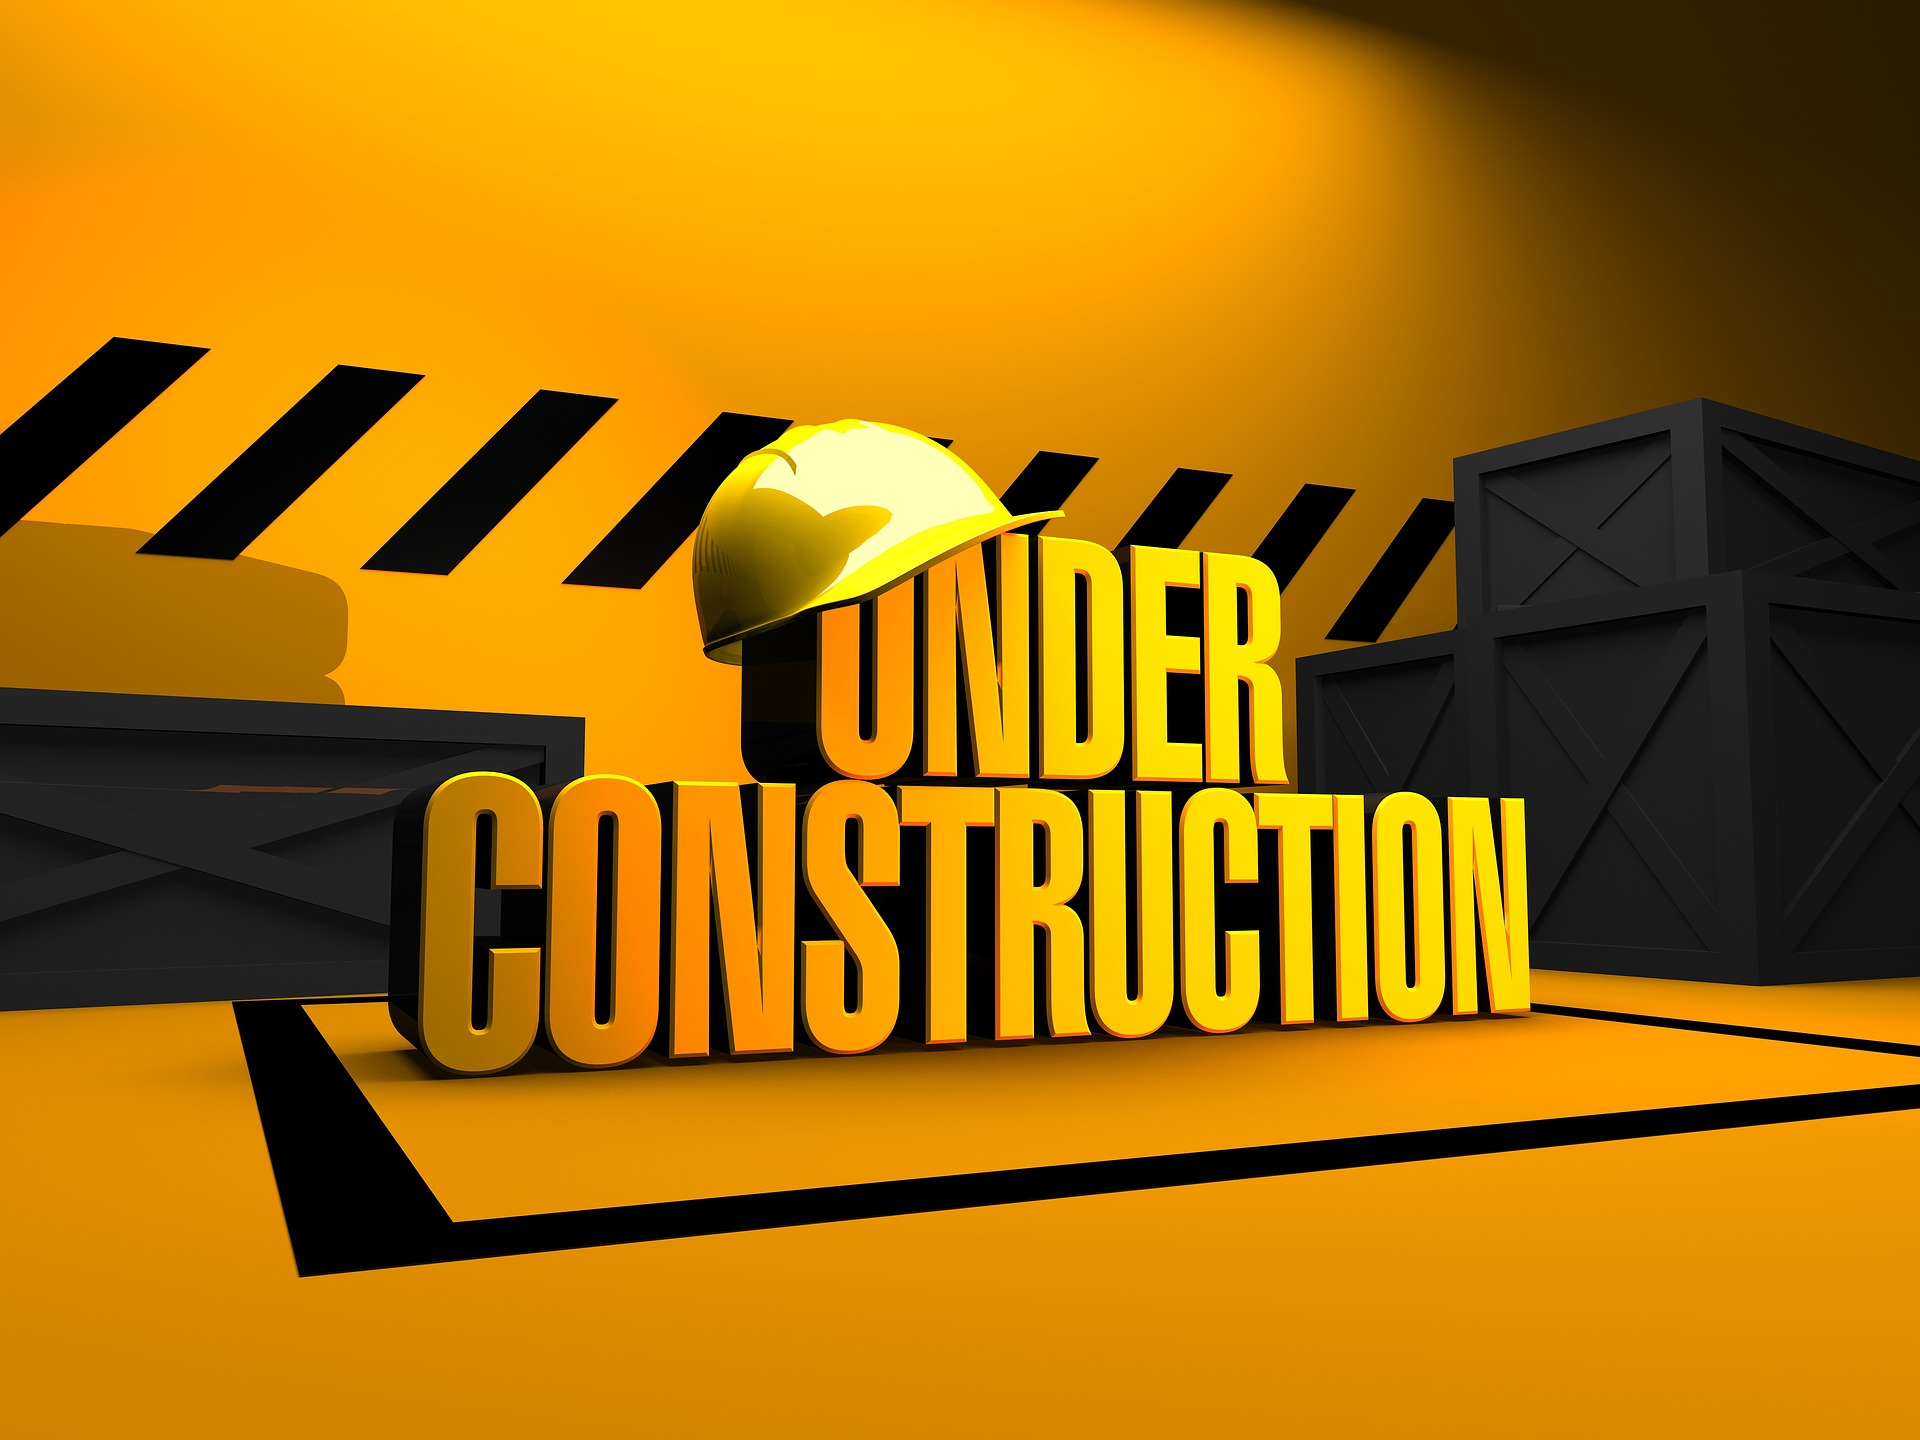 chantier under construction